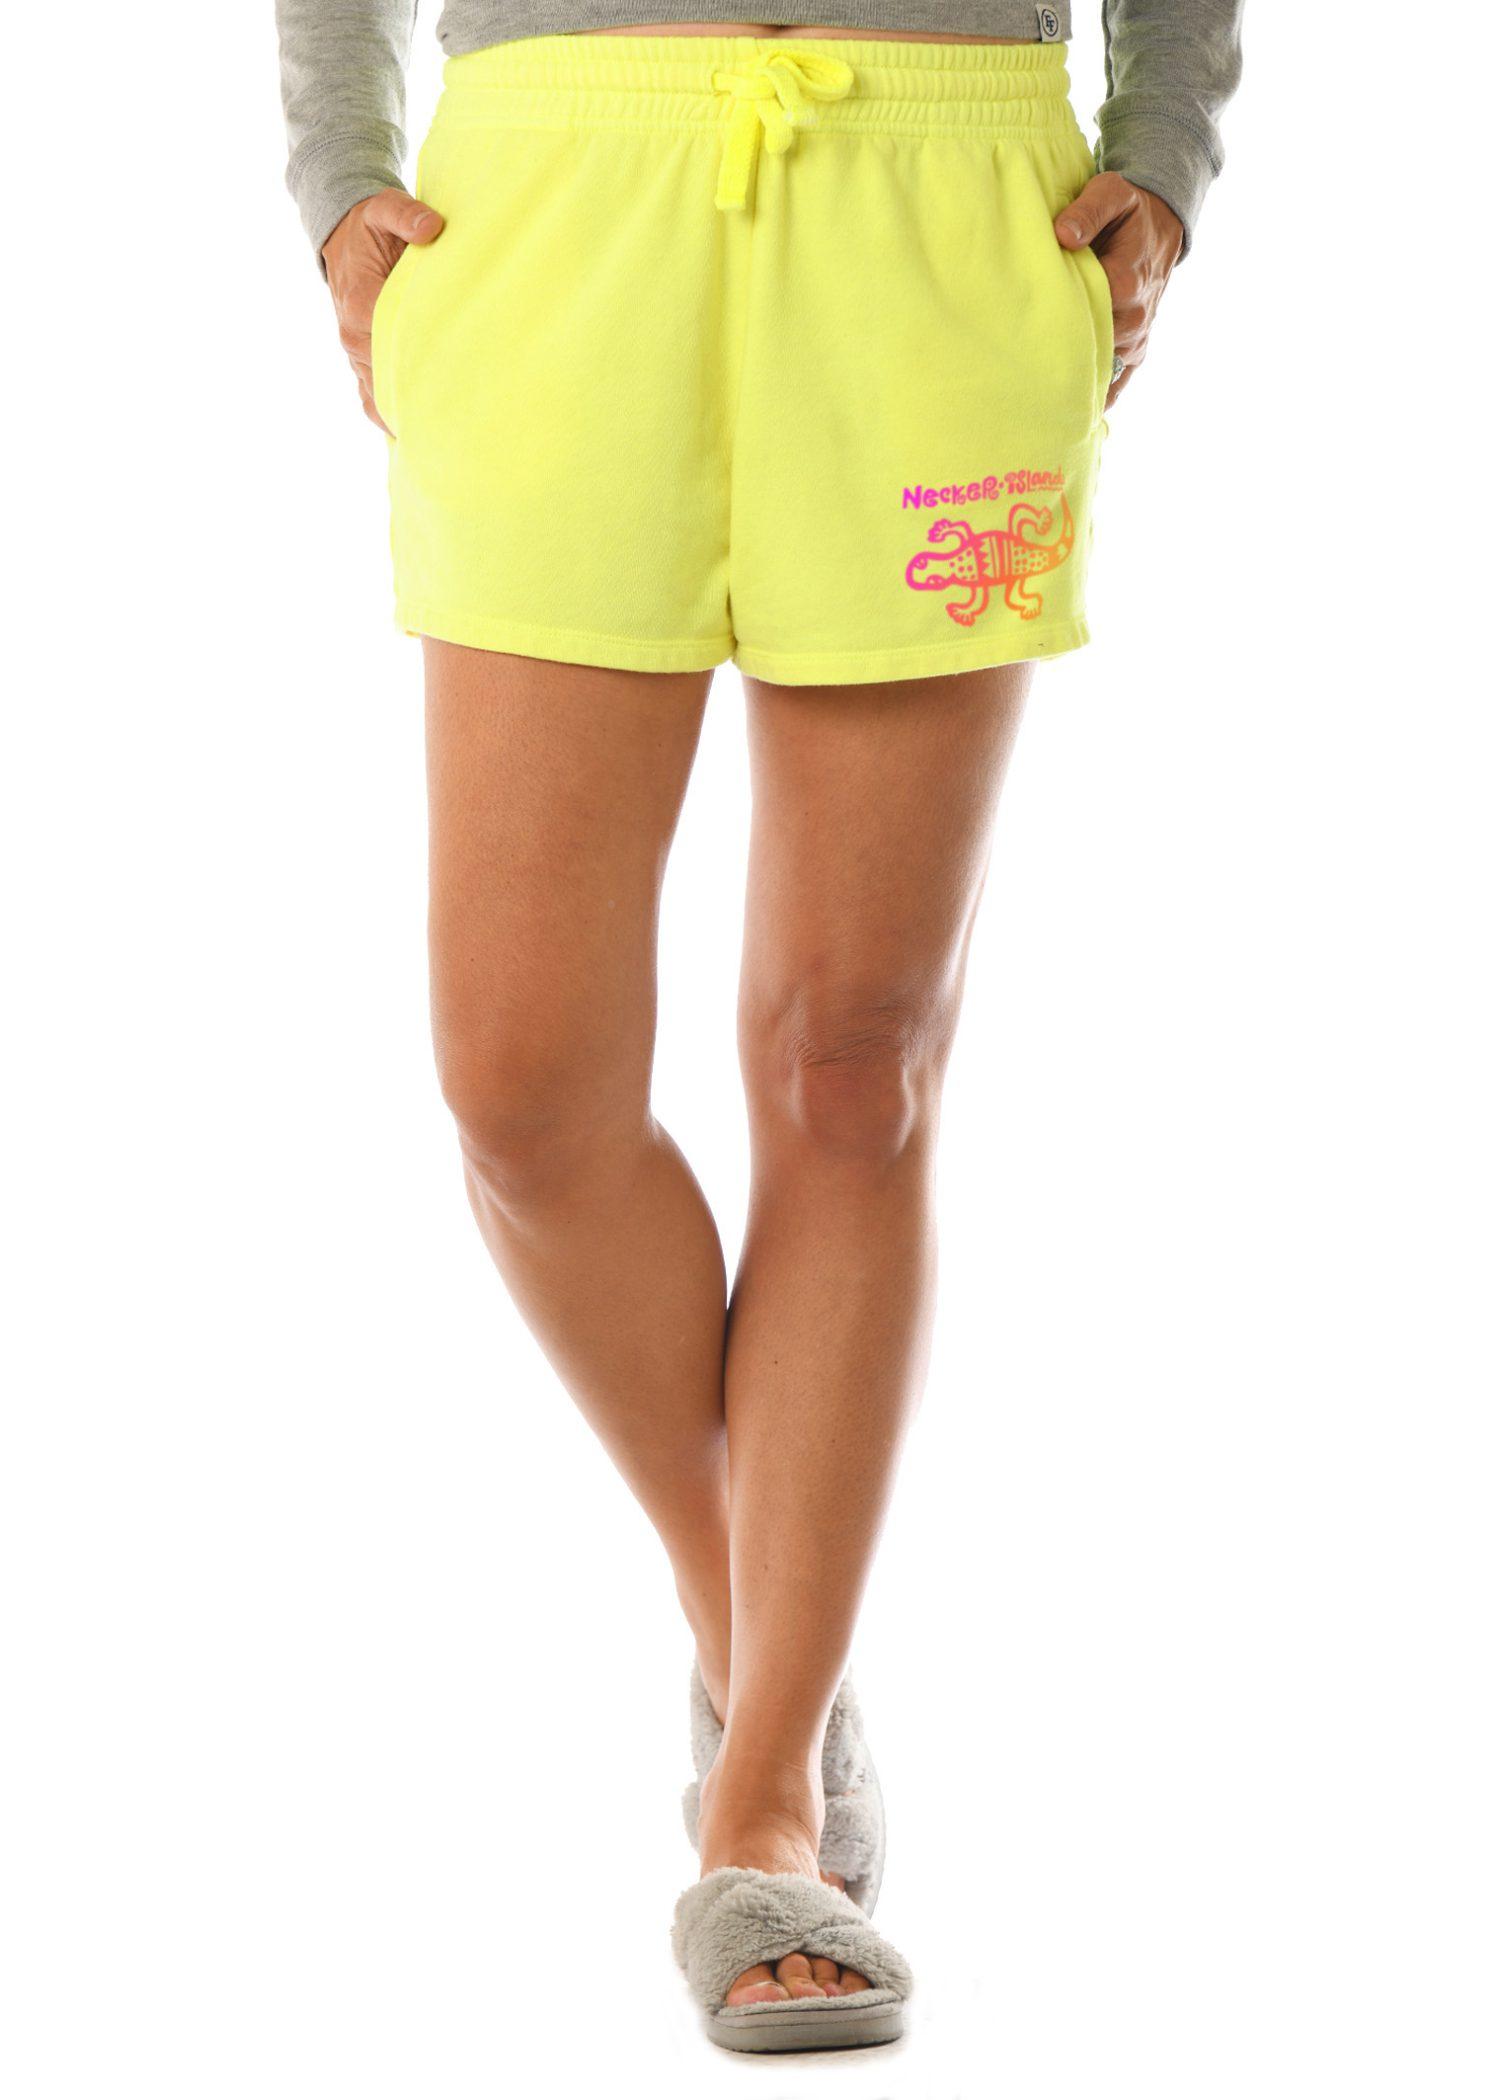 GG 362-FT M Women's Shorts-Front